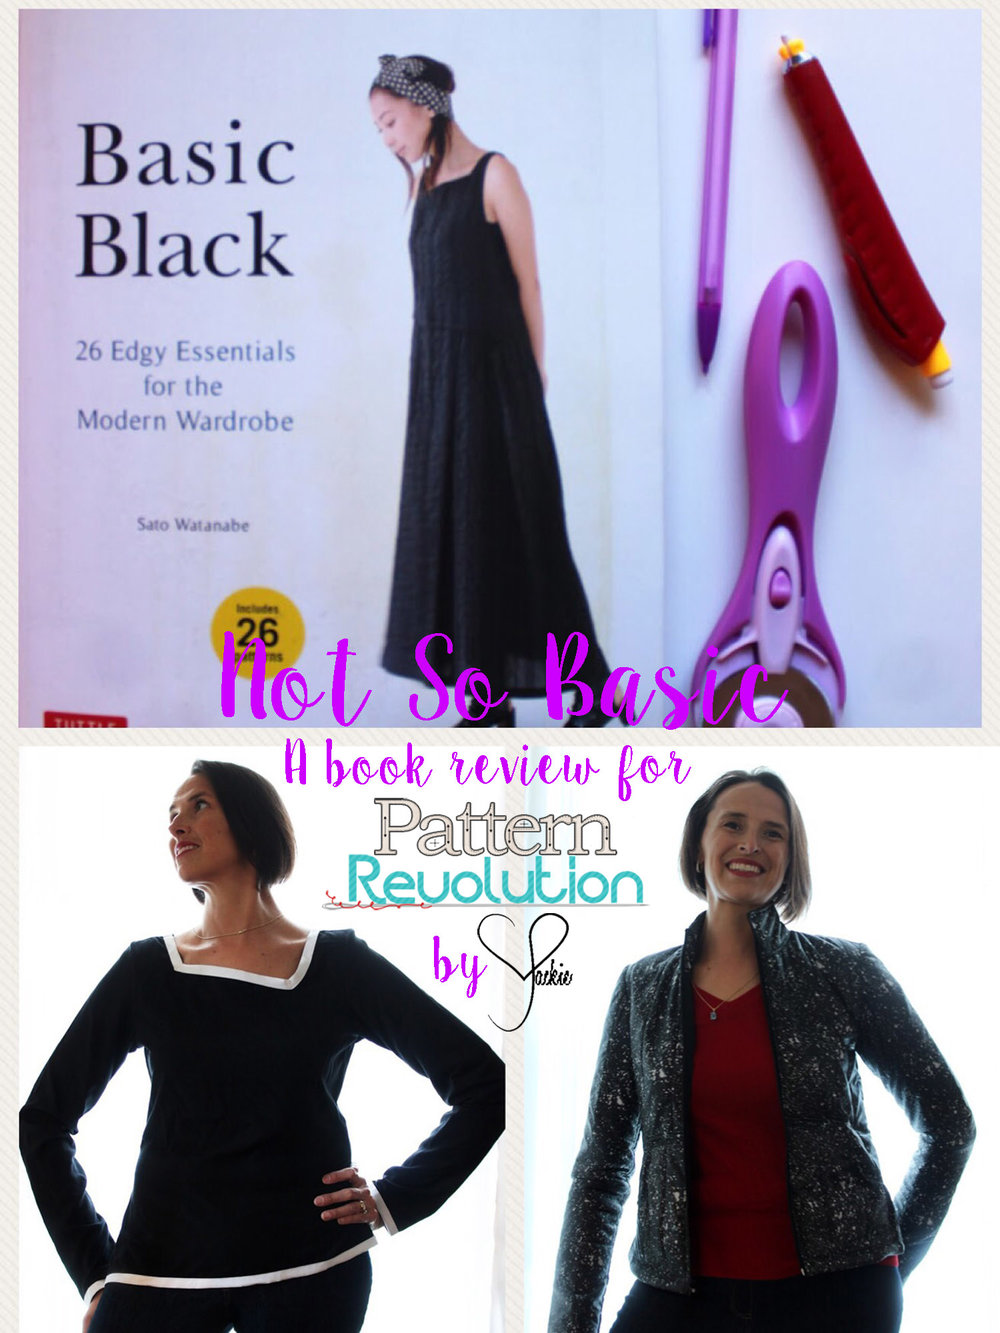 JB_Basic Black book review_pinnable image.jpg